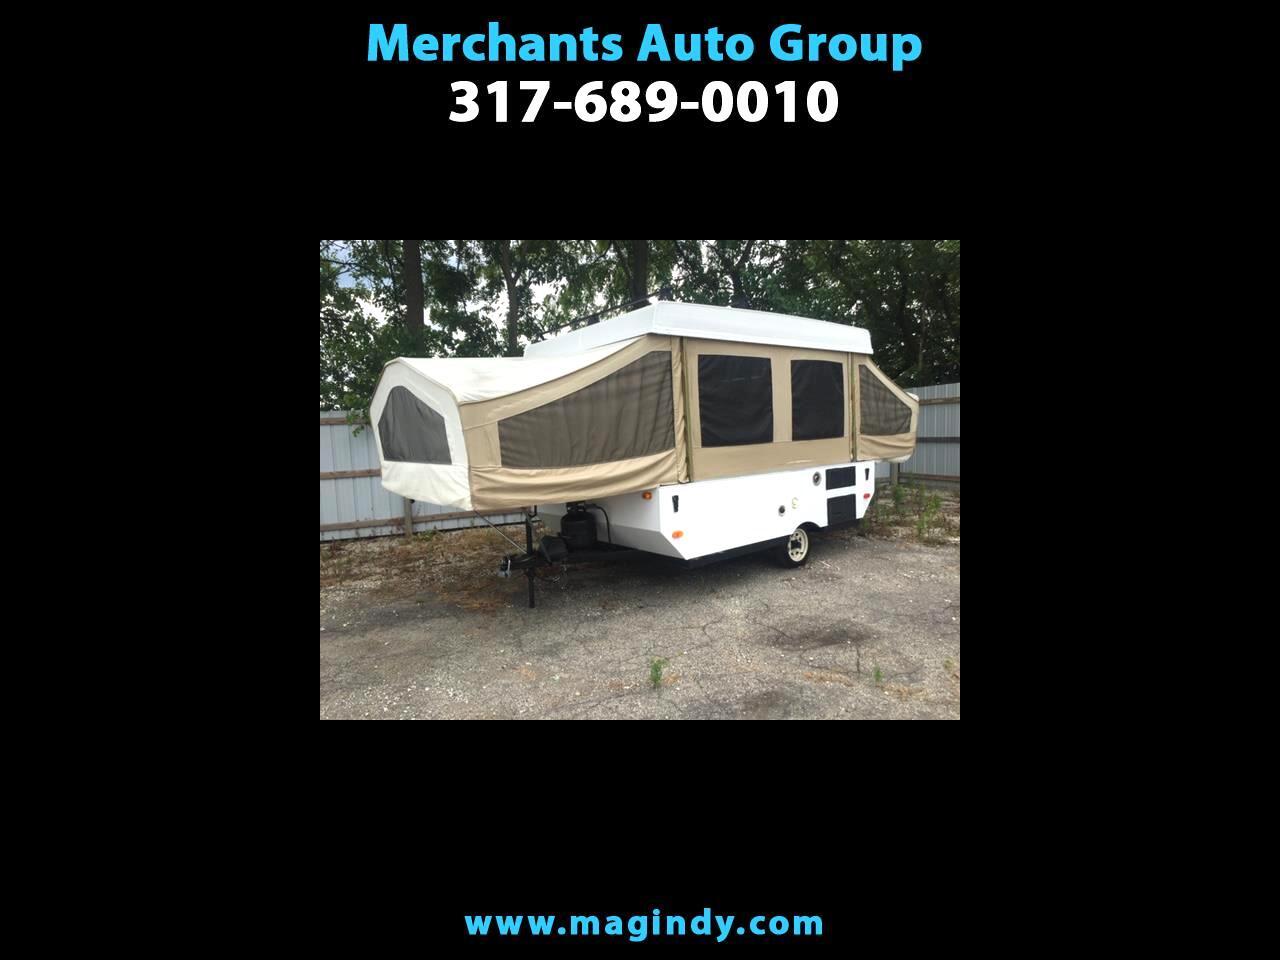 1994 Flagstaff Cobra Popup Camper Pull Behind